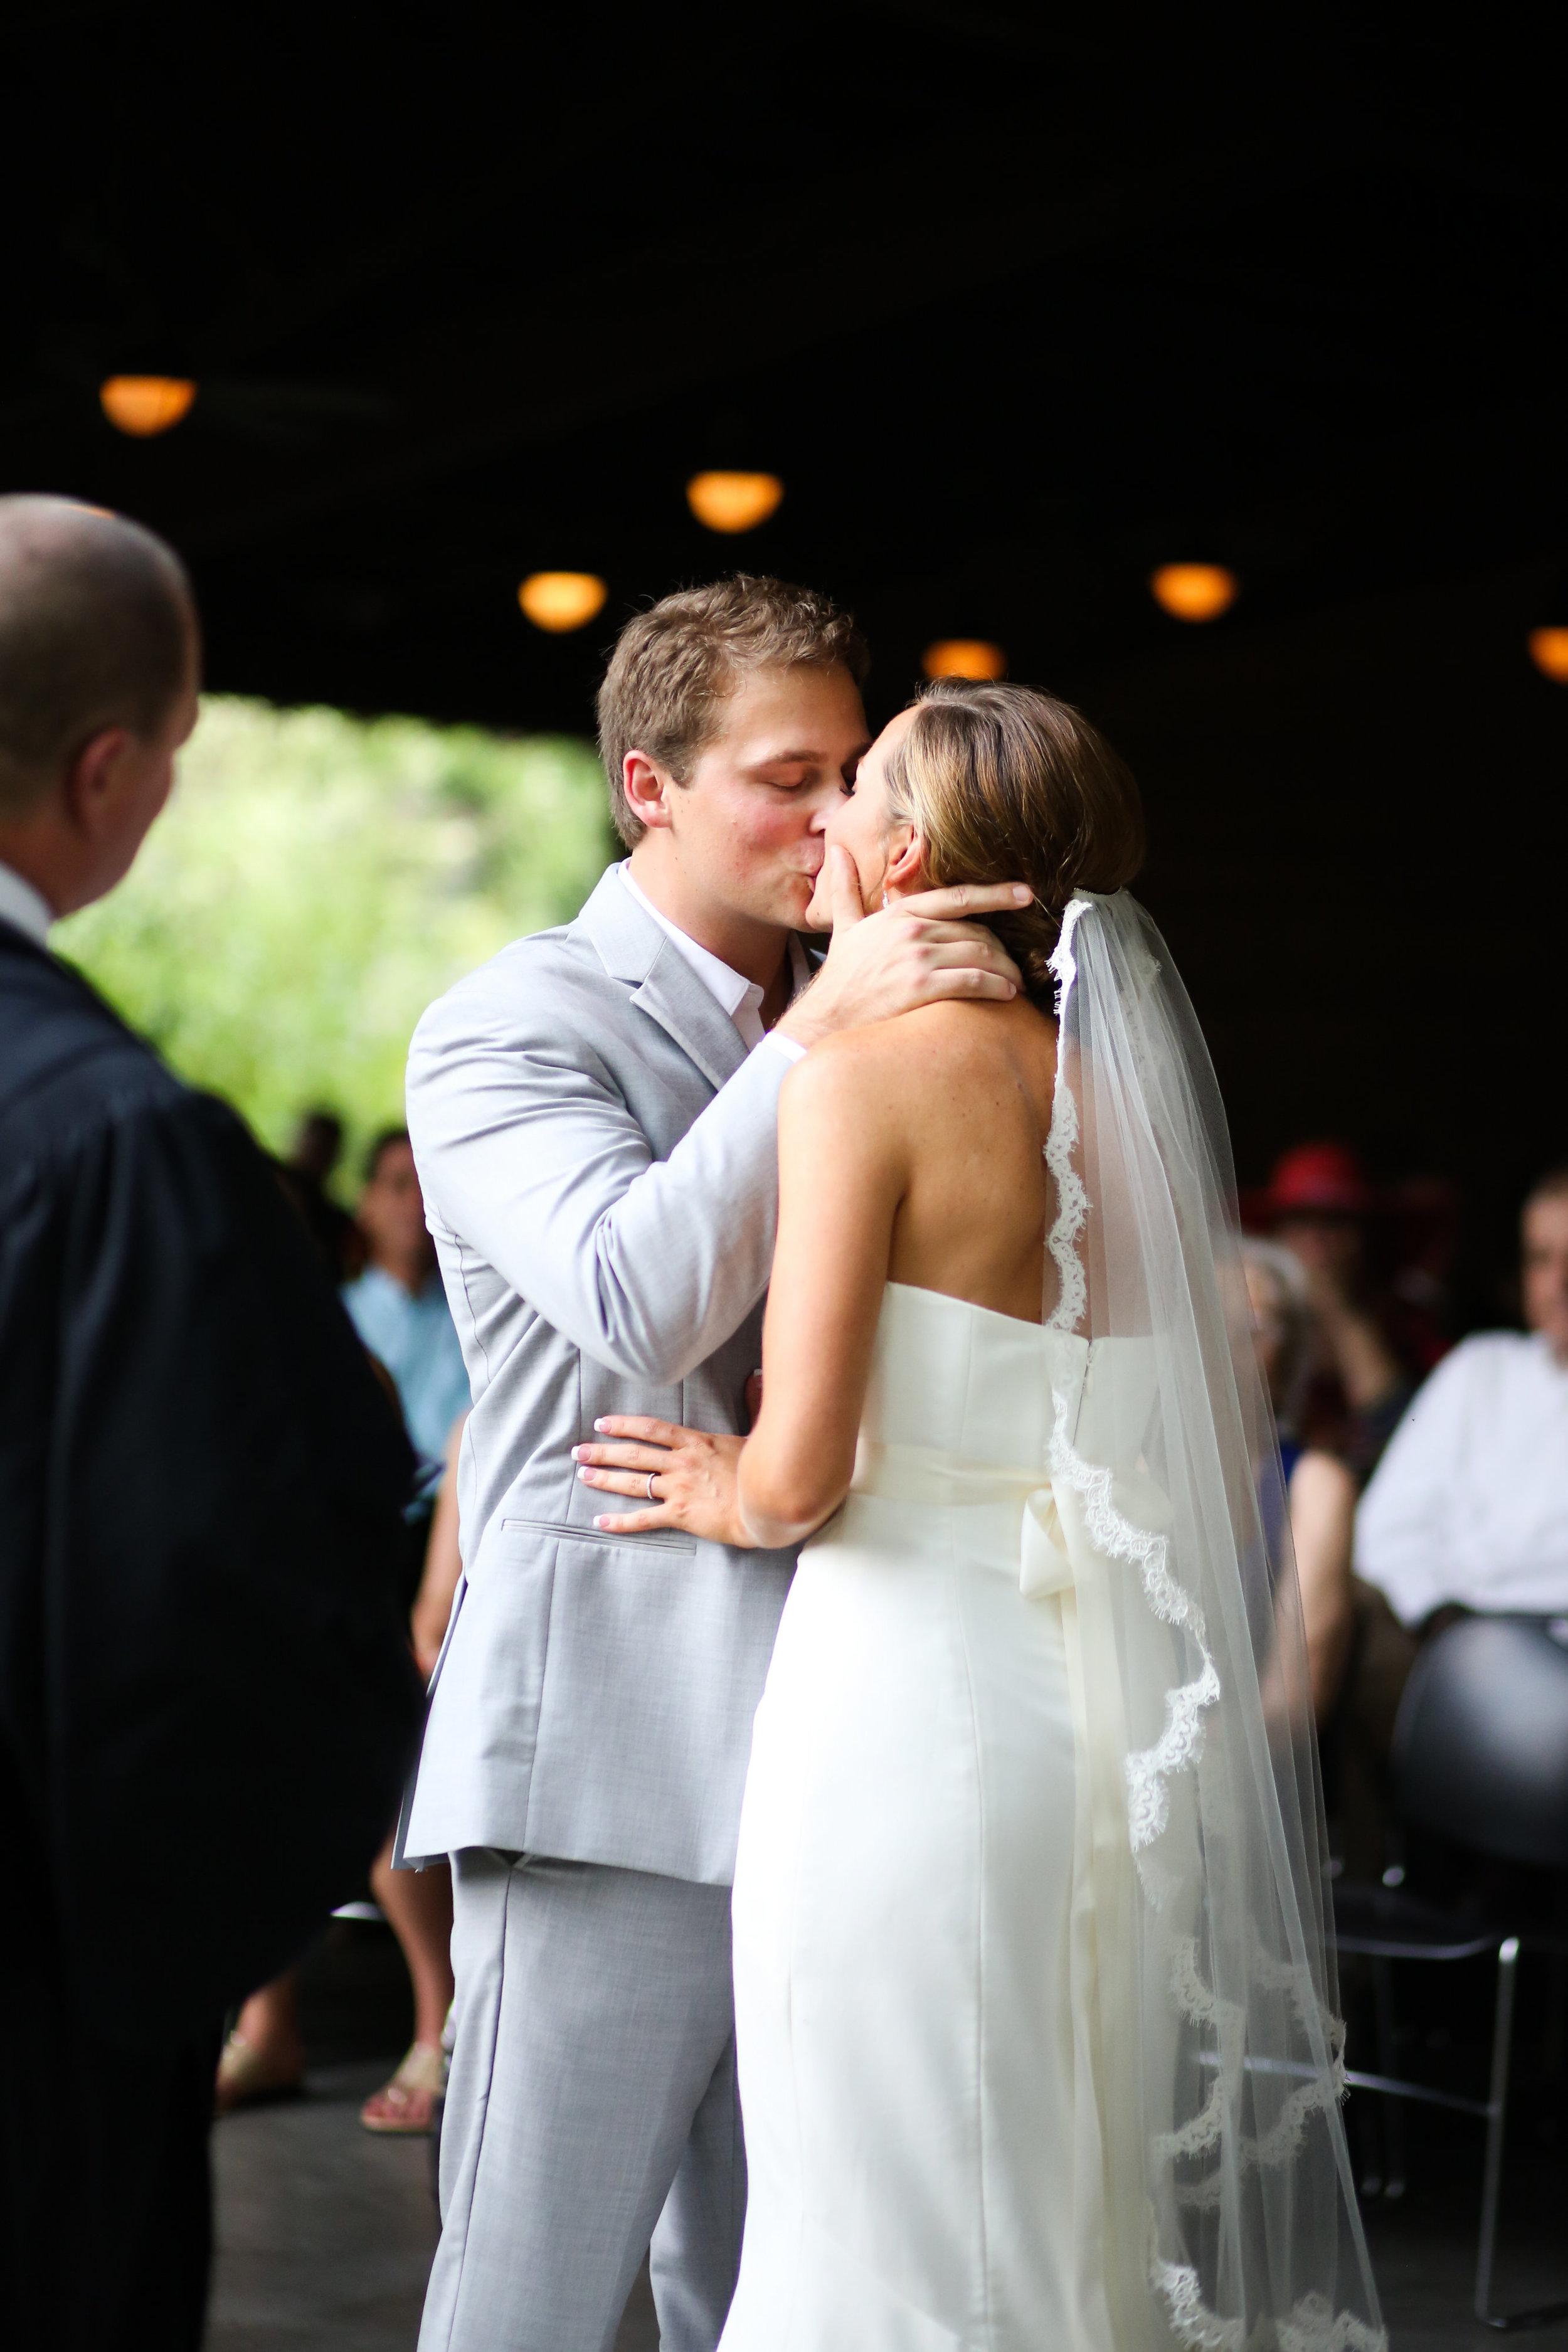 finnegan-photography-ivory-and-beau-bridal-boutique-nicole-miller-dakota-jaclyn-jordan-anne-veil-savannah-bridal-boutique-savannah-wedding-dresses-savannah-weddings-statesboro-wedding-barn-wedding-savannah-bridal-georgia-bridal-boutique-15.jpg